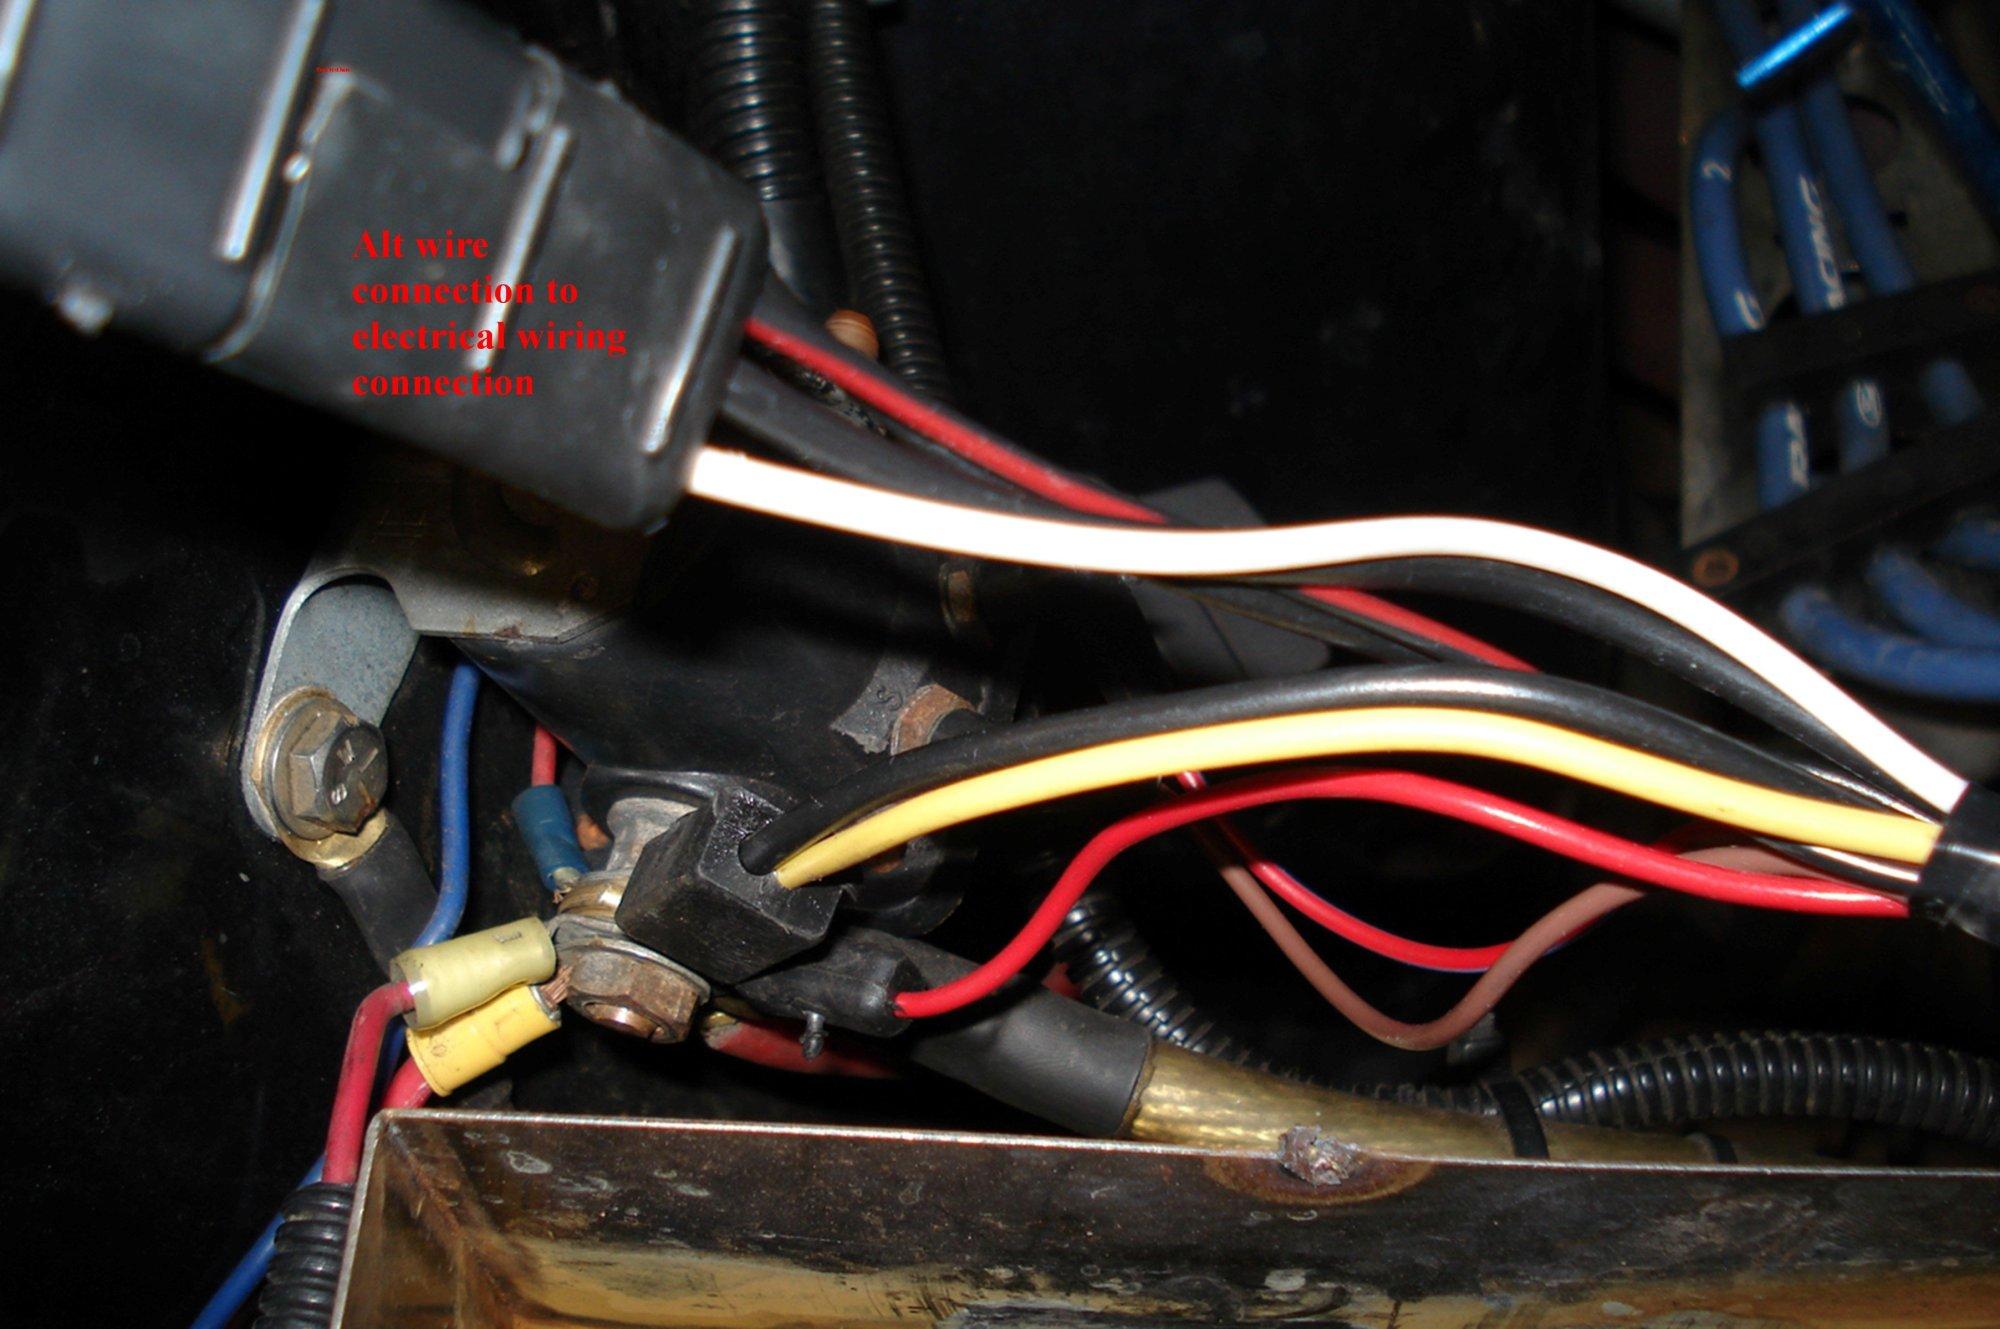 hight resolution of 1967 ford mustang alternator 7078 connection problem ford mustang 67 mustang turn signal hood wiring bracket 67 mustang radio wiring diagram